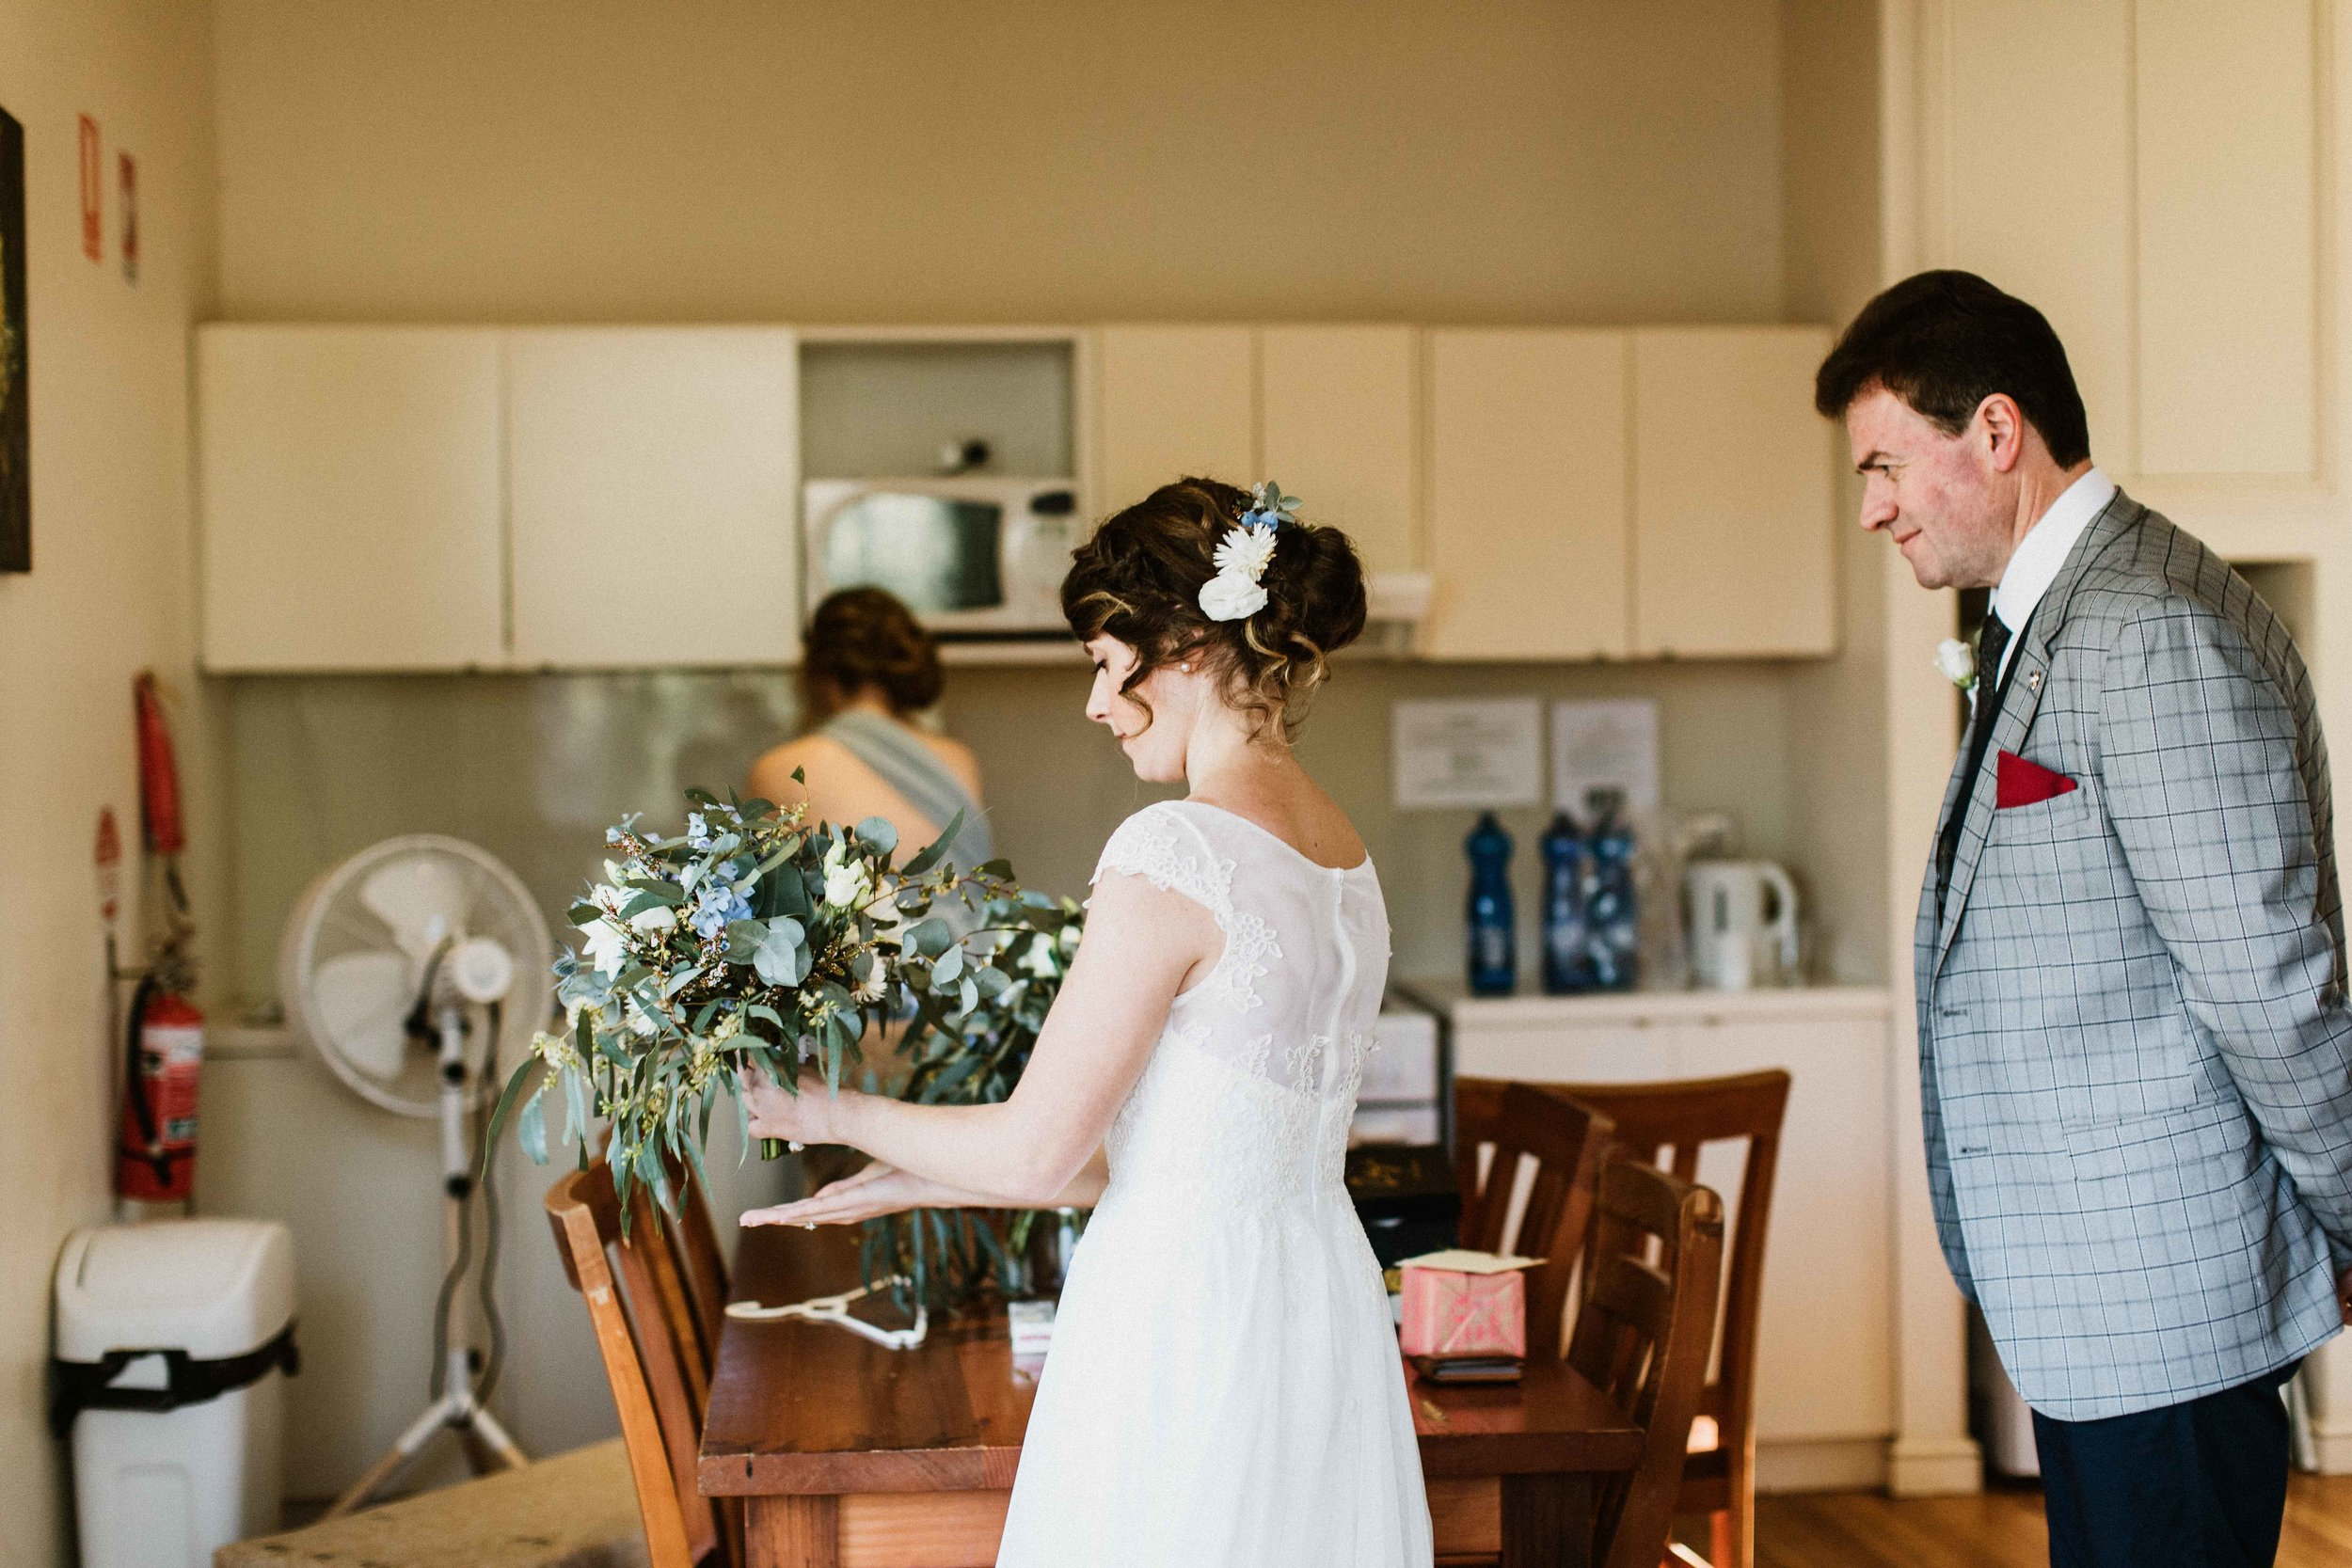 kangaroo-valley-bush-retreat-wedding-lydia-nate-www.emilyobrienphotography.net-38.jpg